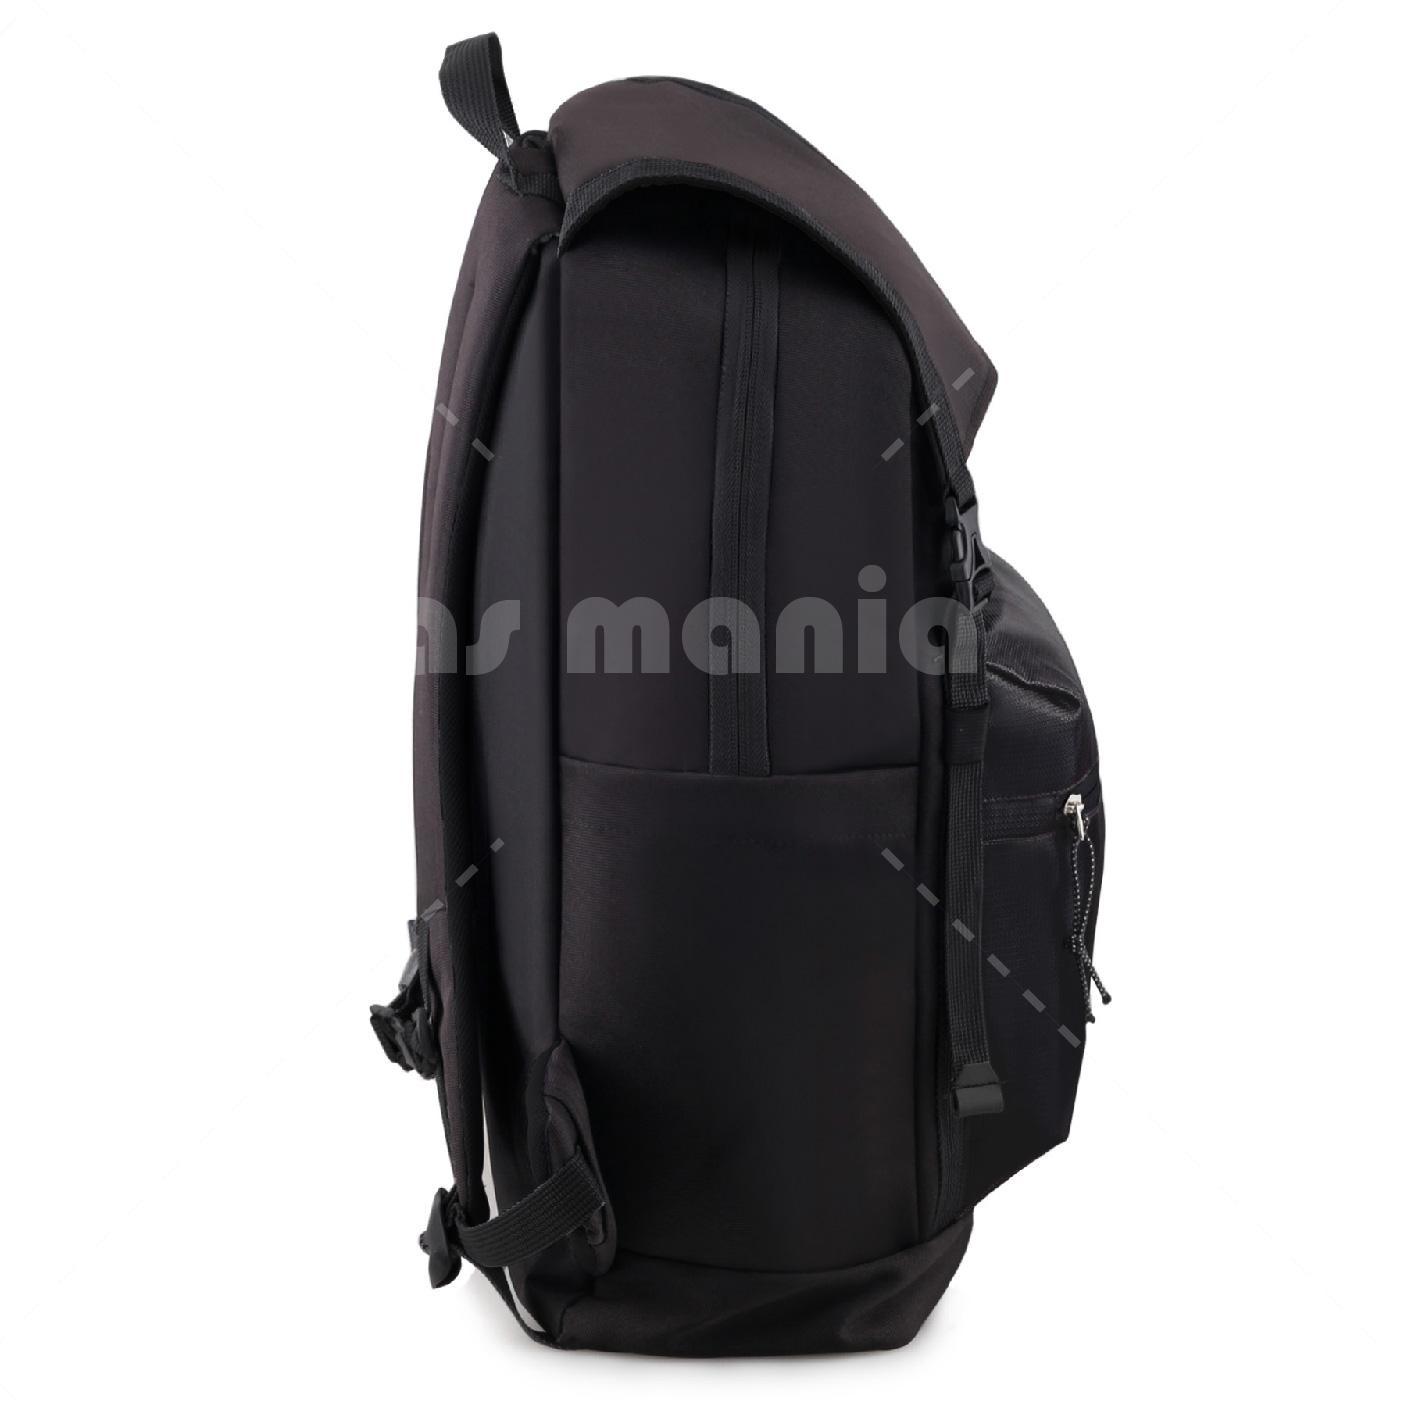 Tas Ransel Gear Bag Colonial Rouster 1.0 Dailypack Tas Laptop Backpack + FREE .